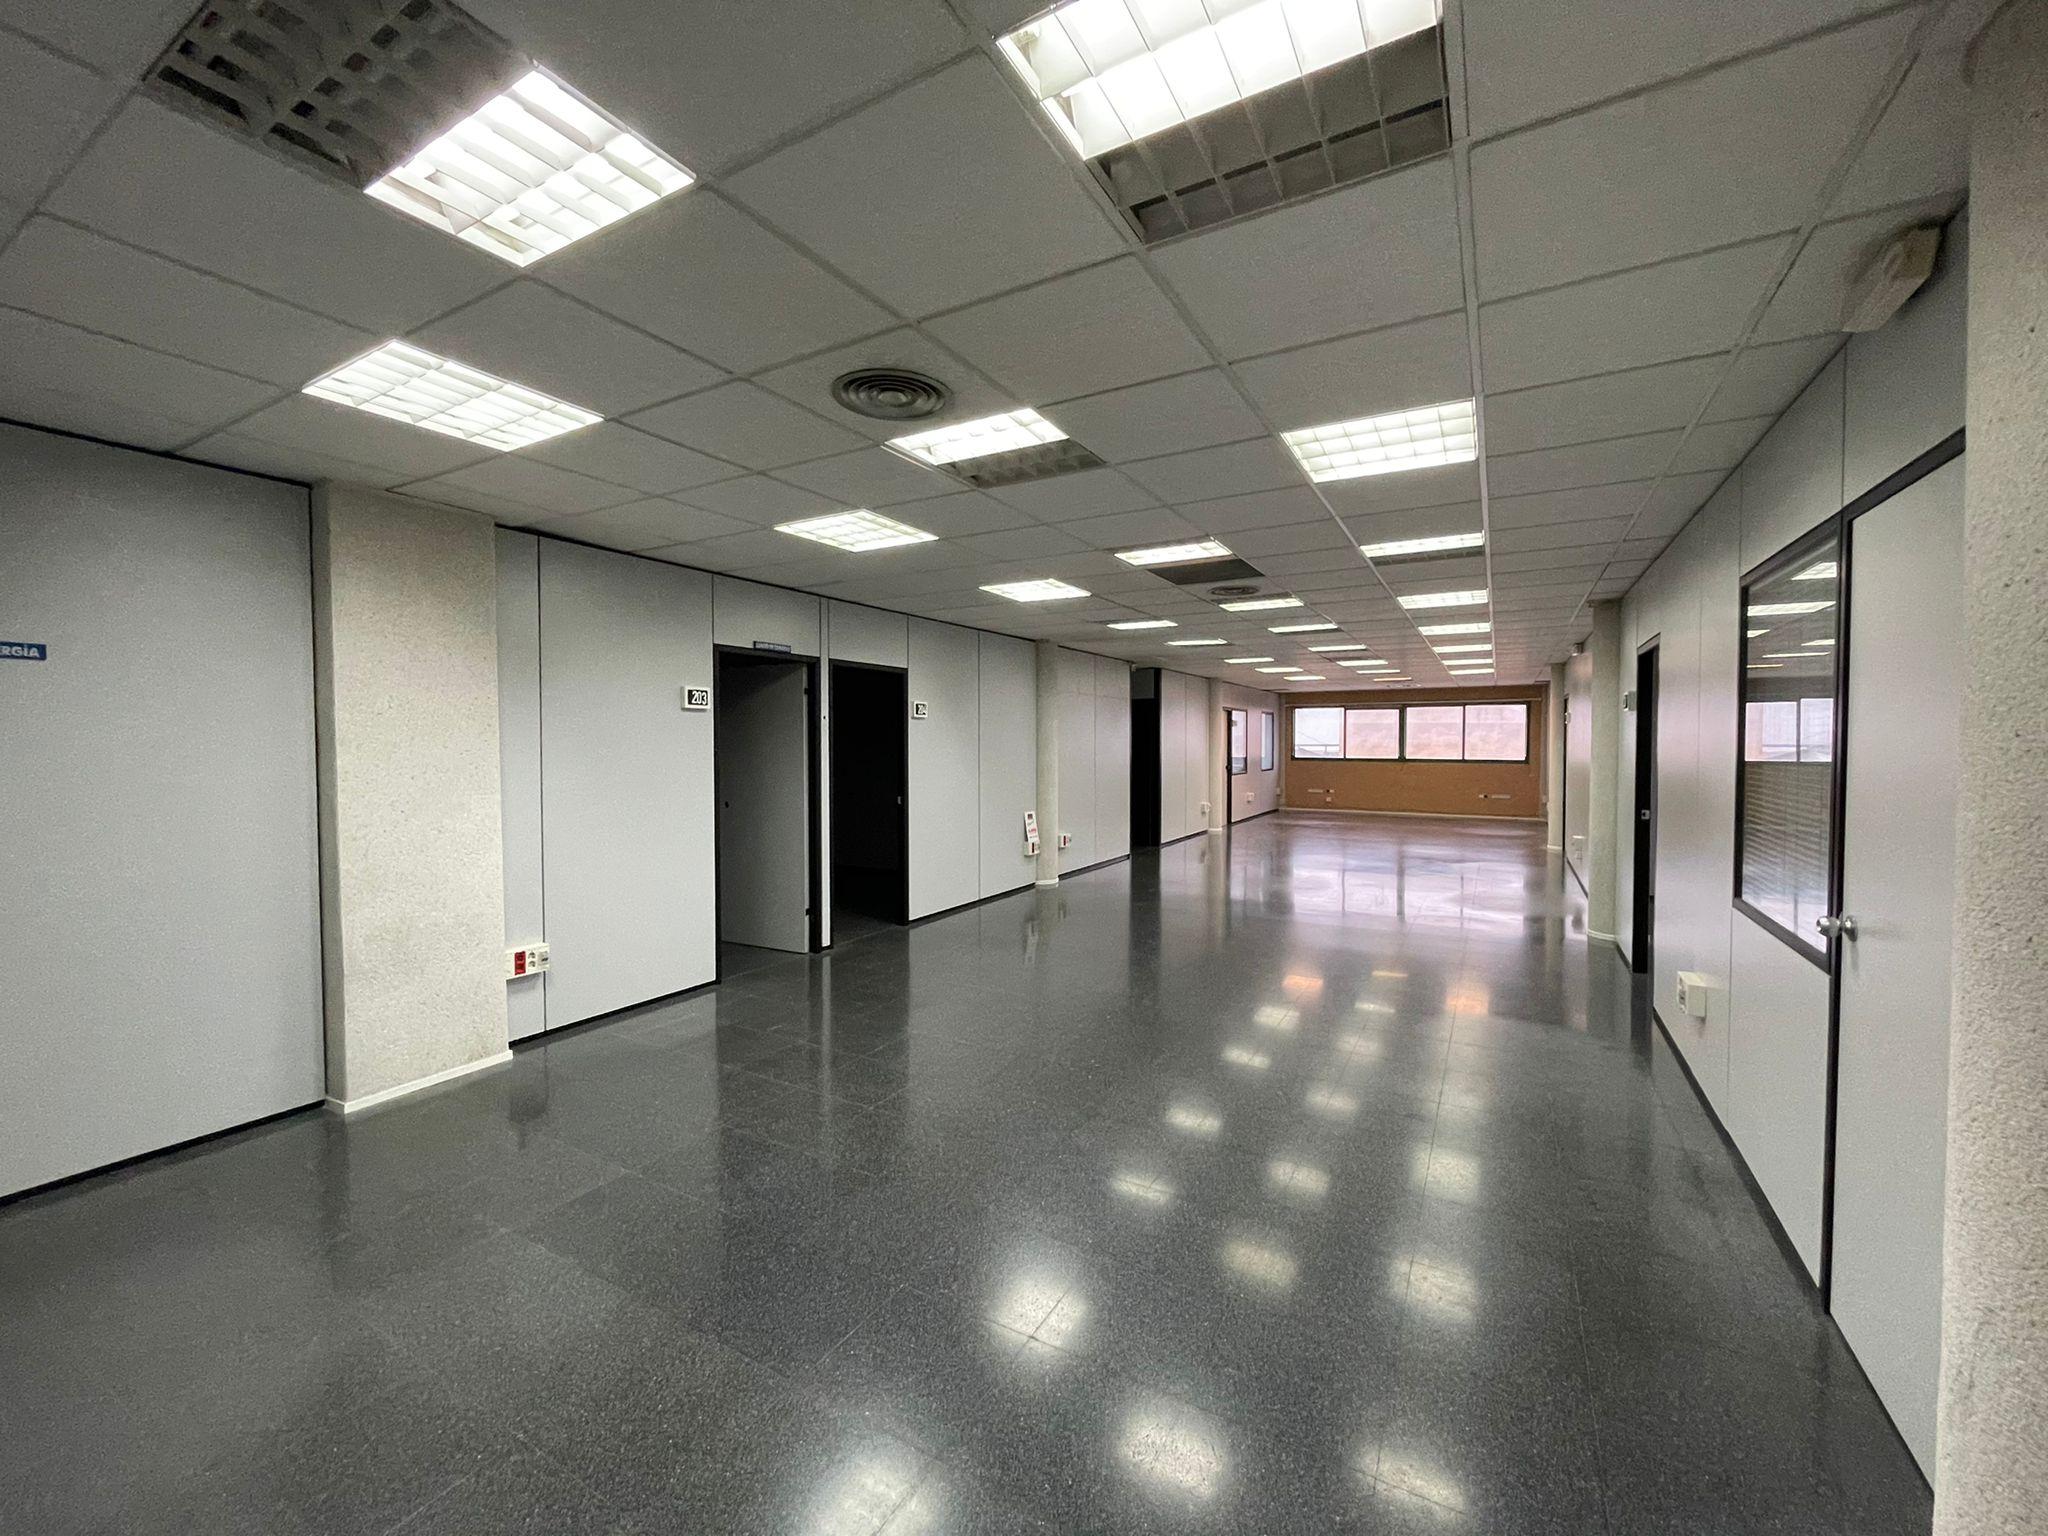 Venta de oficinas tpf consultora inmobiliaria for Oficina de extranjeros valencia